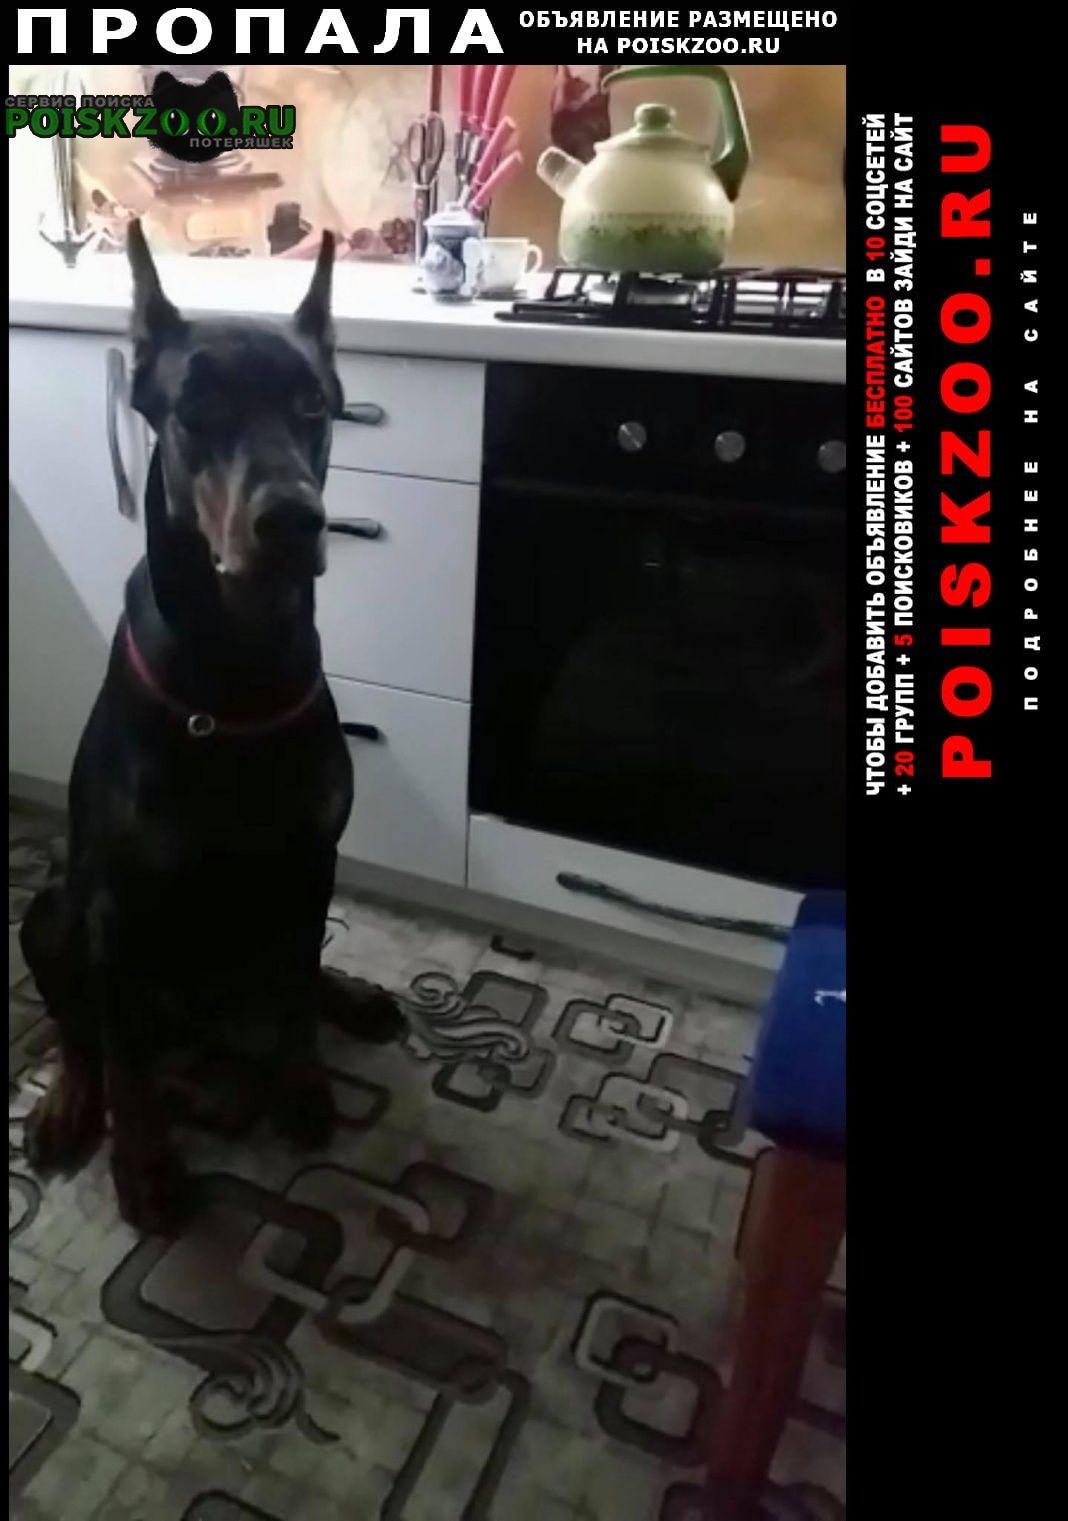 Пропала собака кобель доберман Ростов-на-Дону